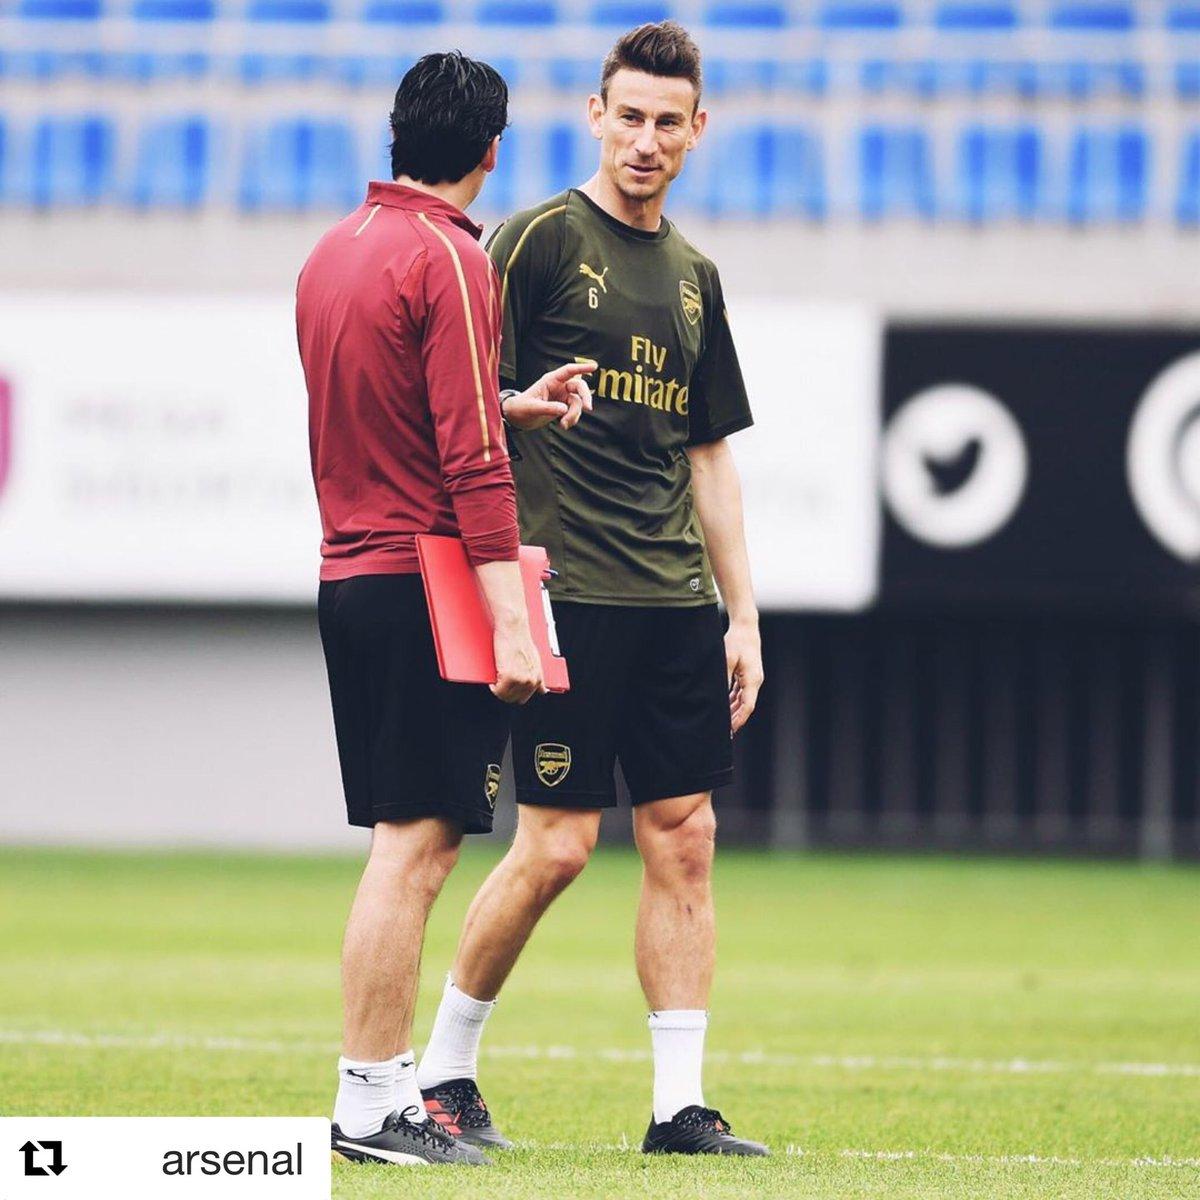 First Baku session 🤙🏻 @Arsenal https://t.co/YRyh5xNzJm